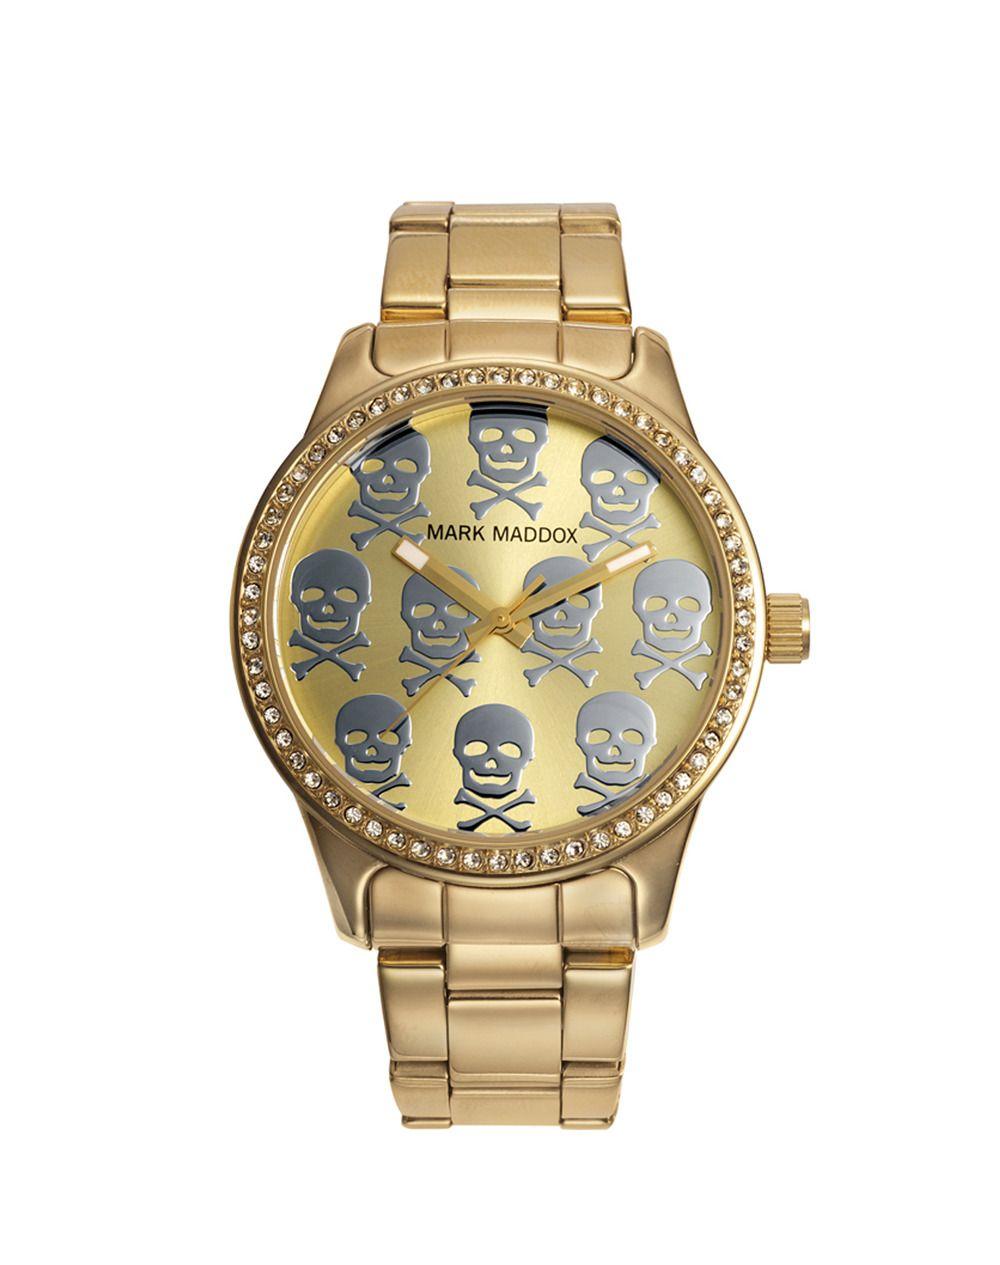 bb43d5ad4cfc Reloj de mujer Mark Maddox de El Corte Inglés | Fashion | Watches ...